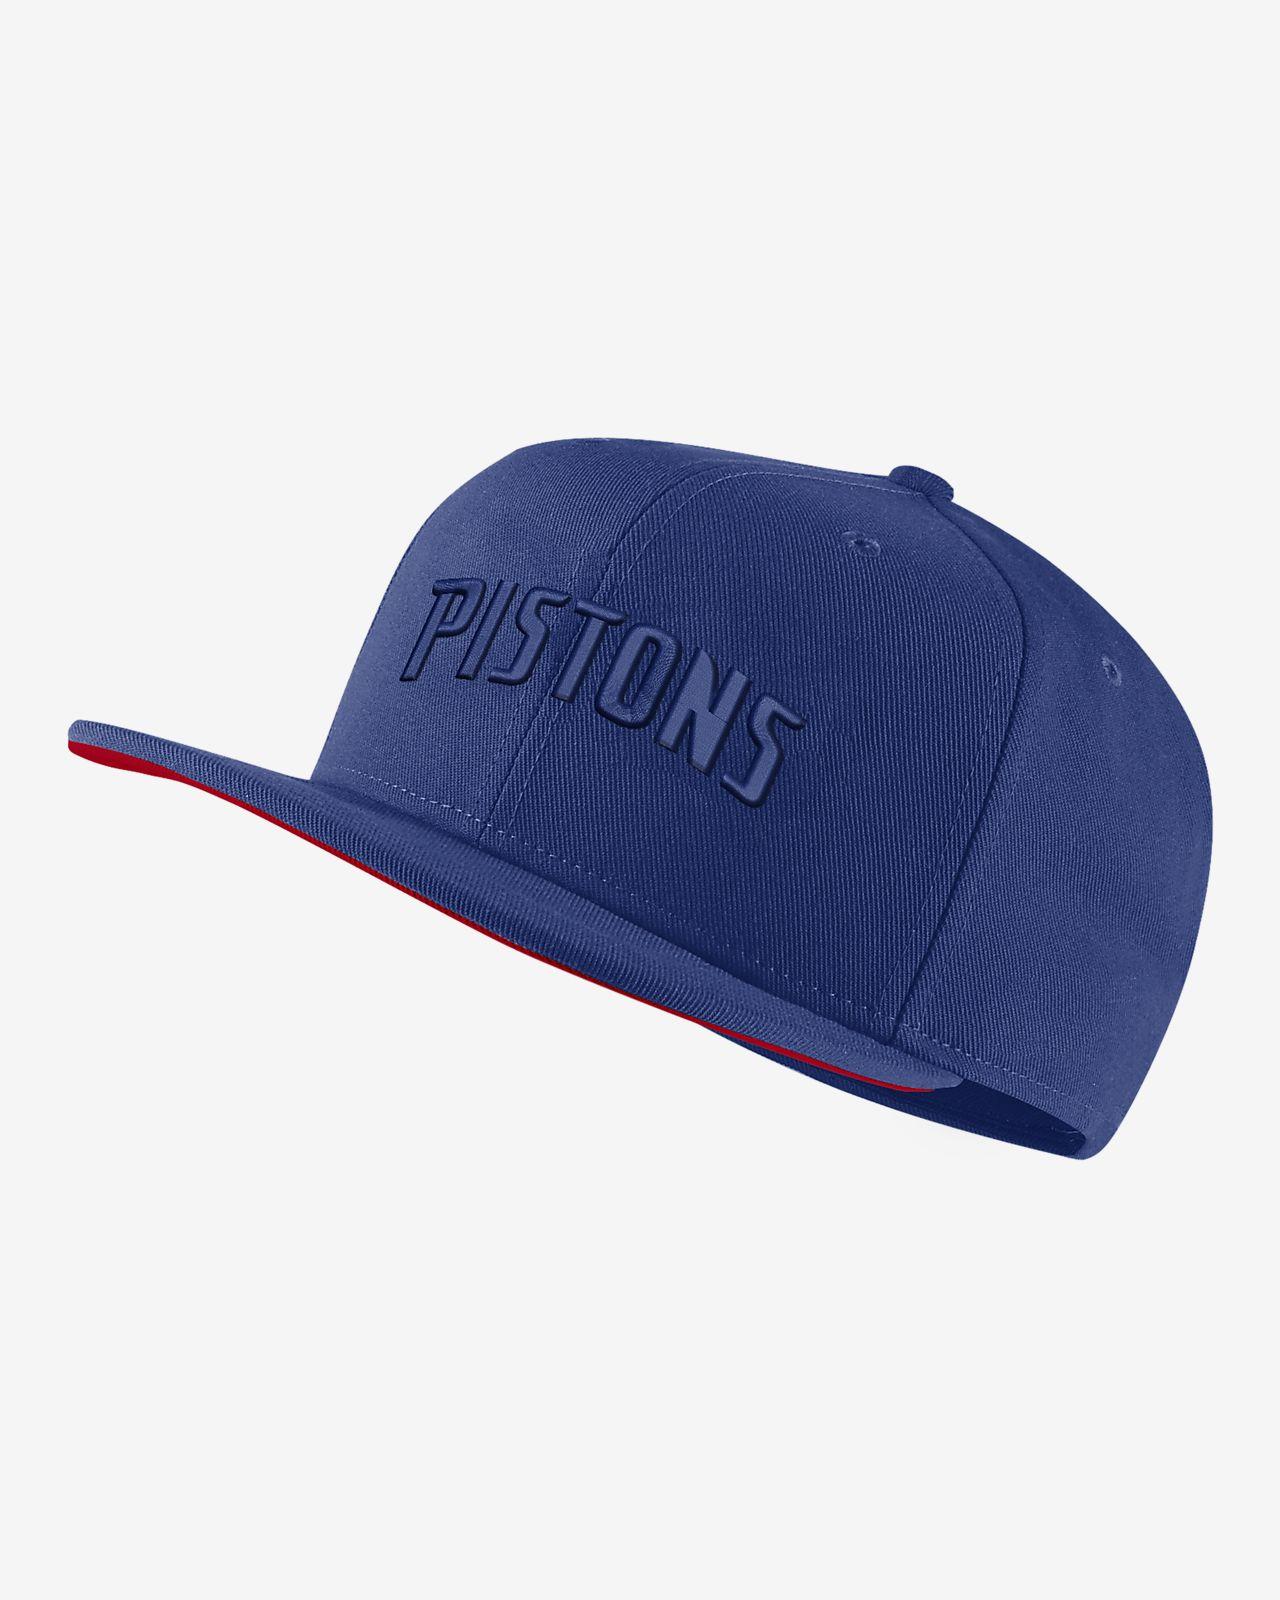 Detroit Pistons Nike AeroBill NBA Hat